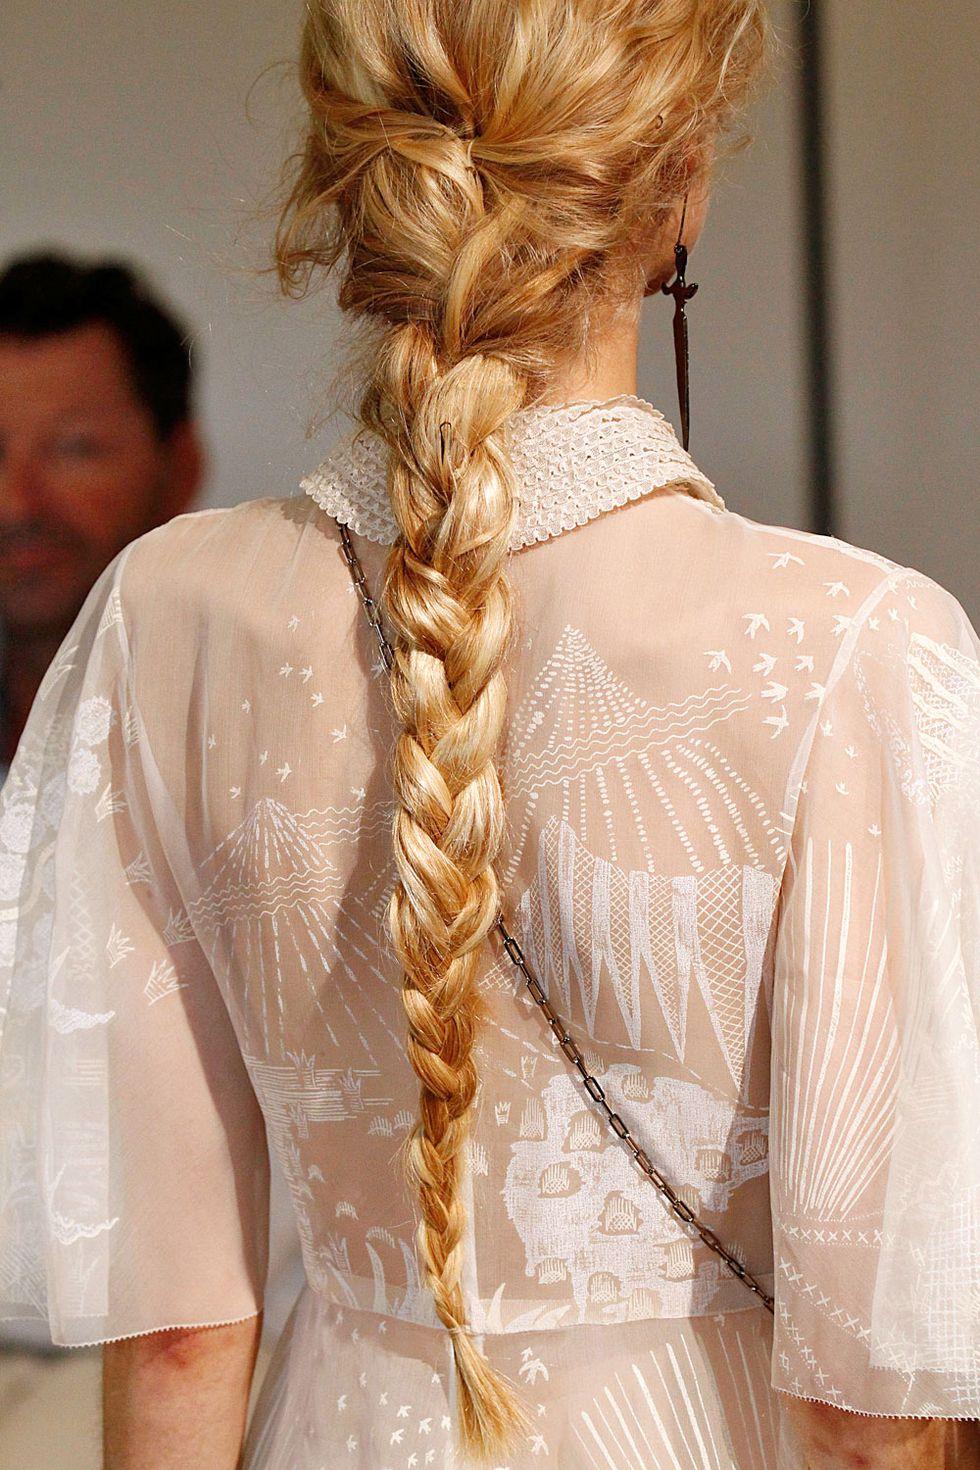 wedding-guest-hair-braid-style-beauty-braid-blonde-french-long.jpg